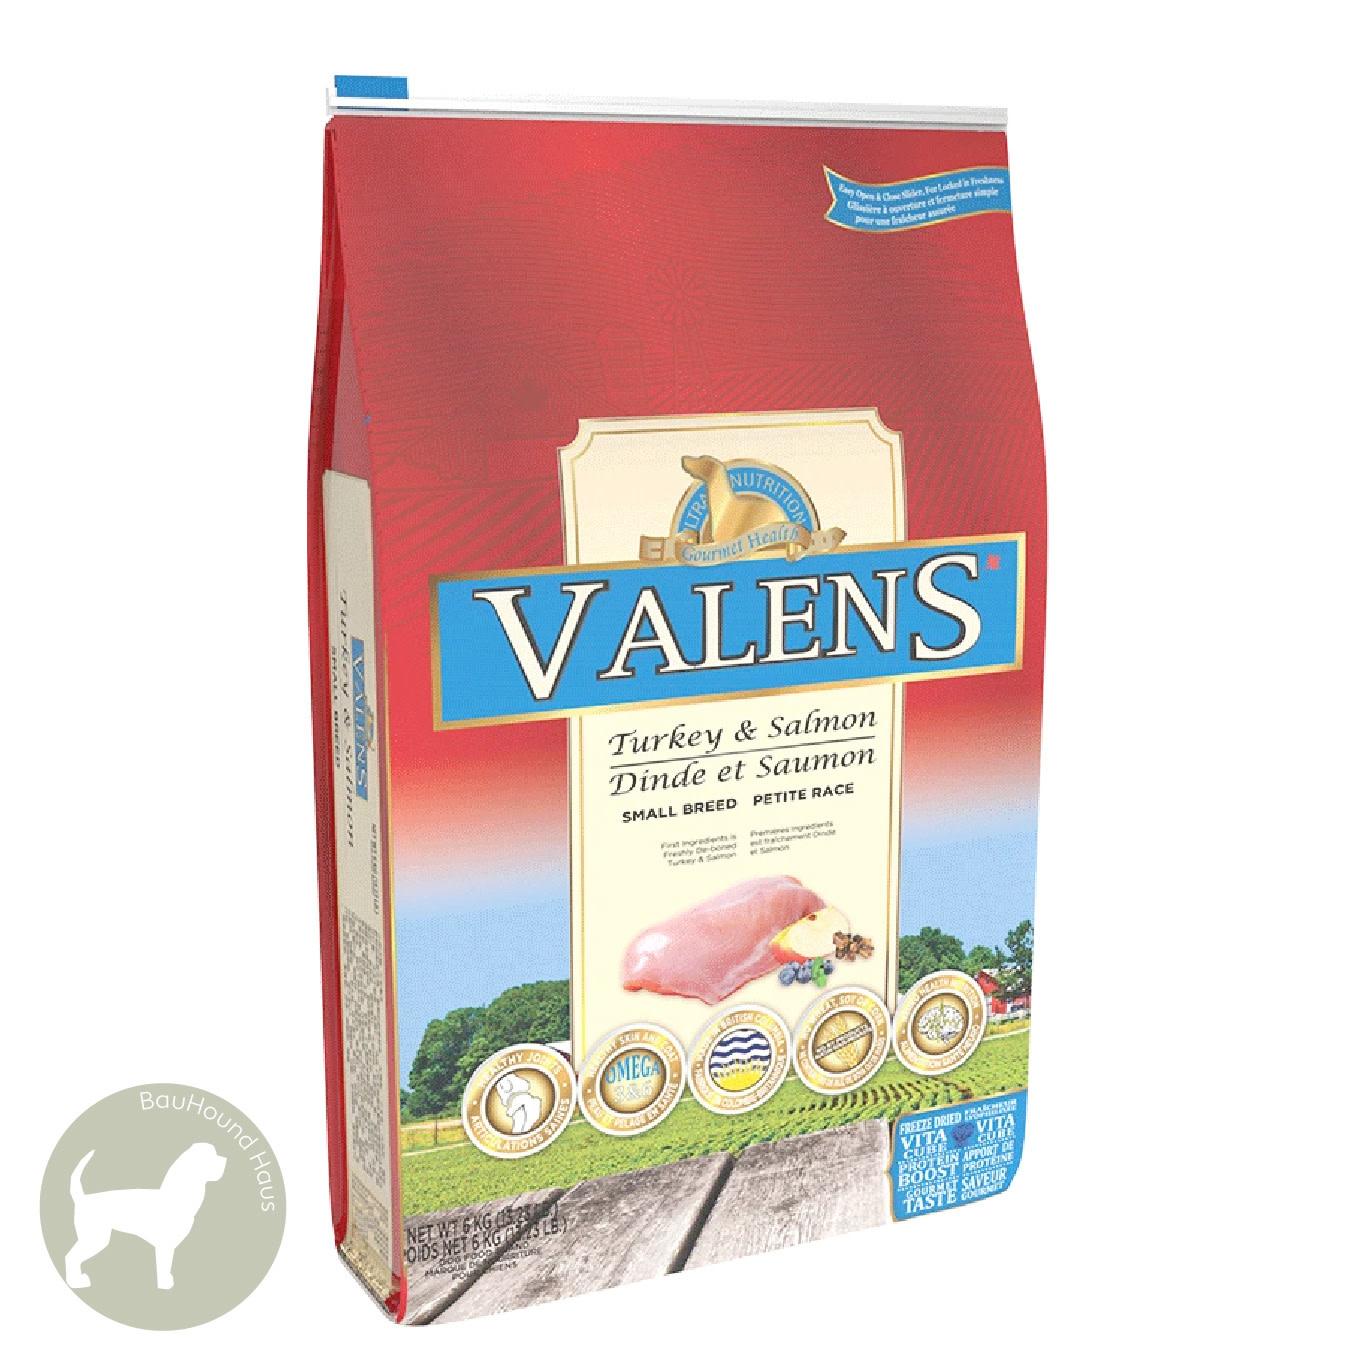 Valens Valens Small Breed Turkey & Salmon, 13.2lb